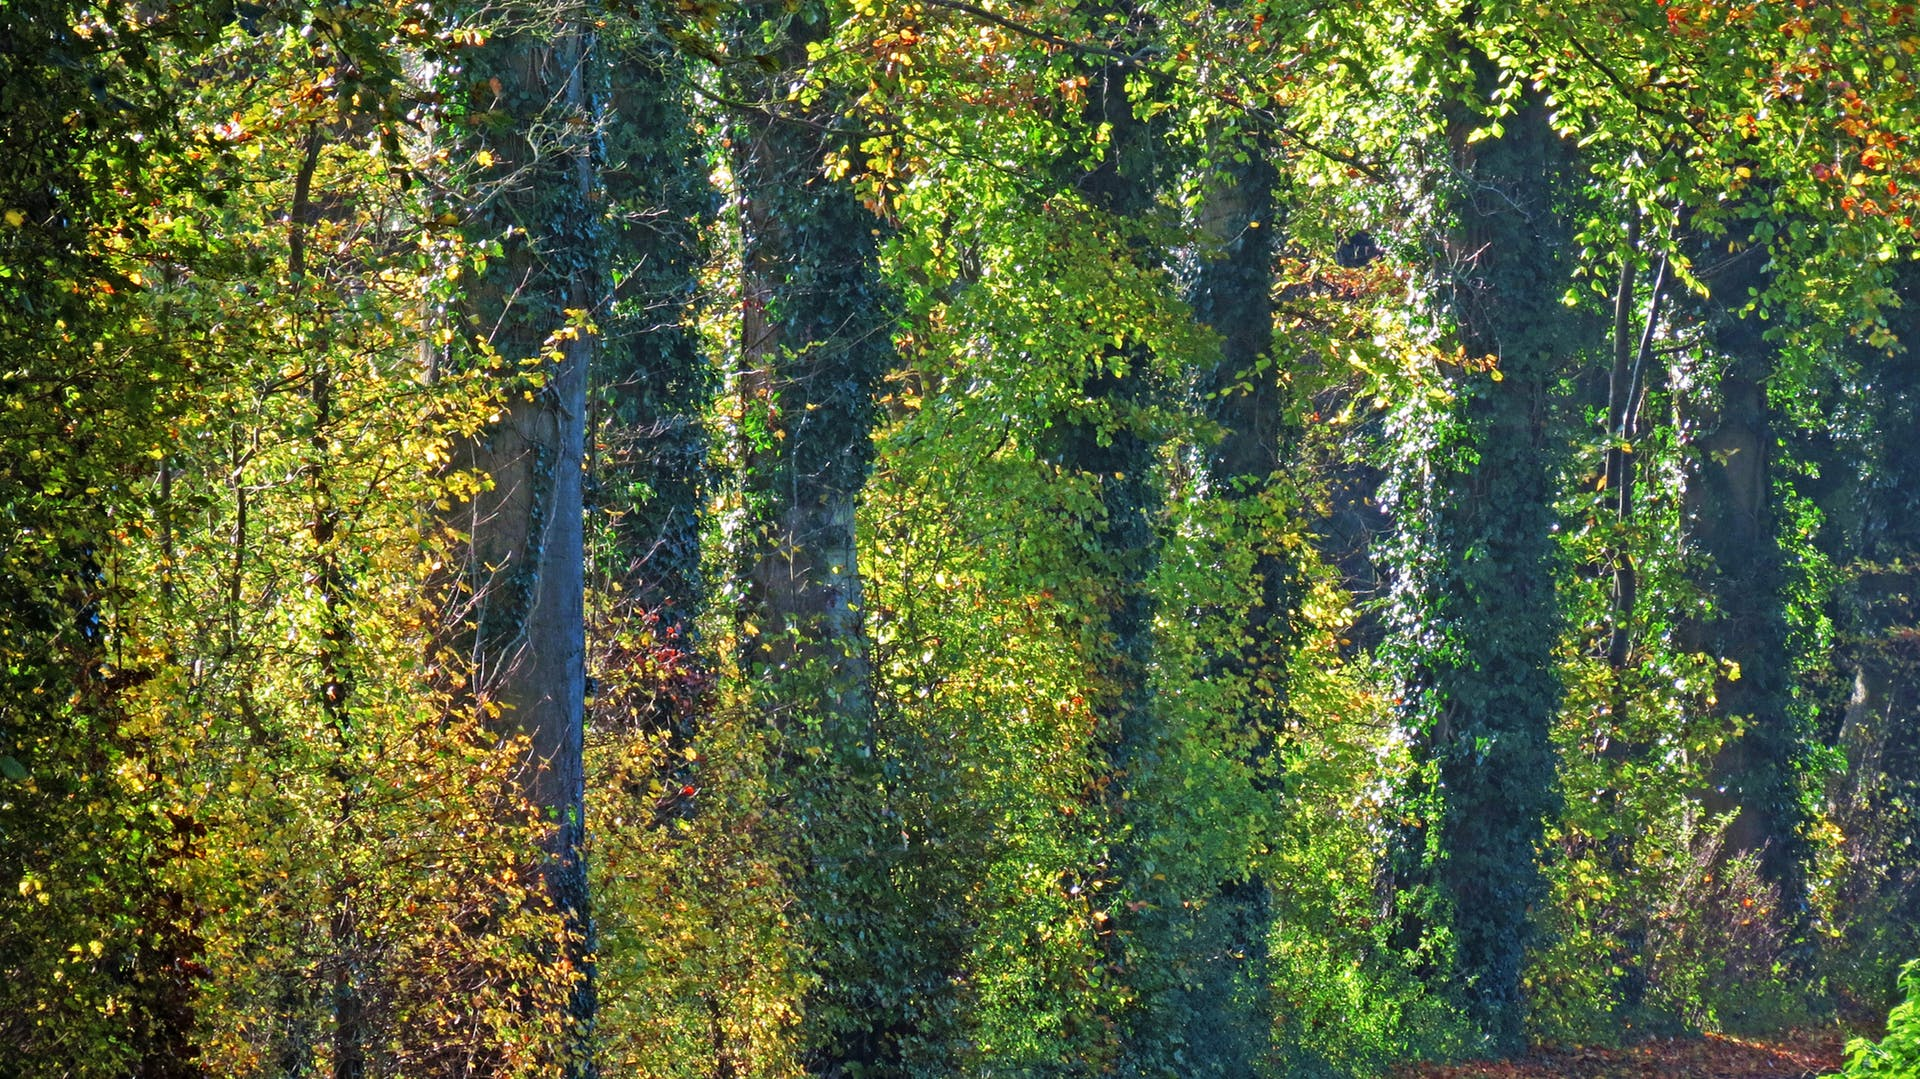 autumn trees woodland englishgh seaside trees